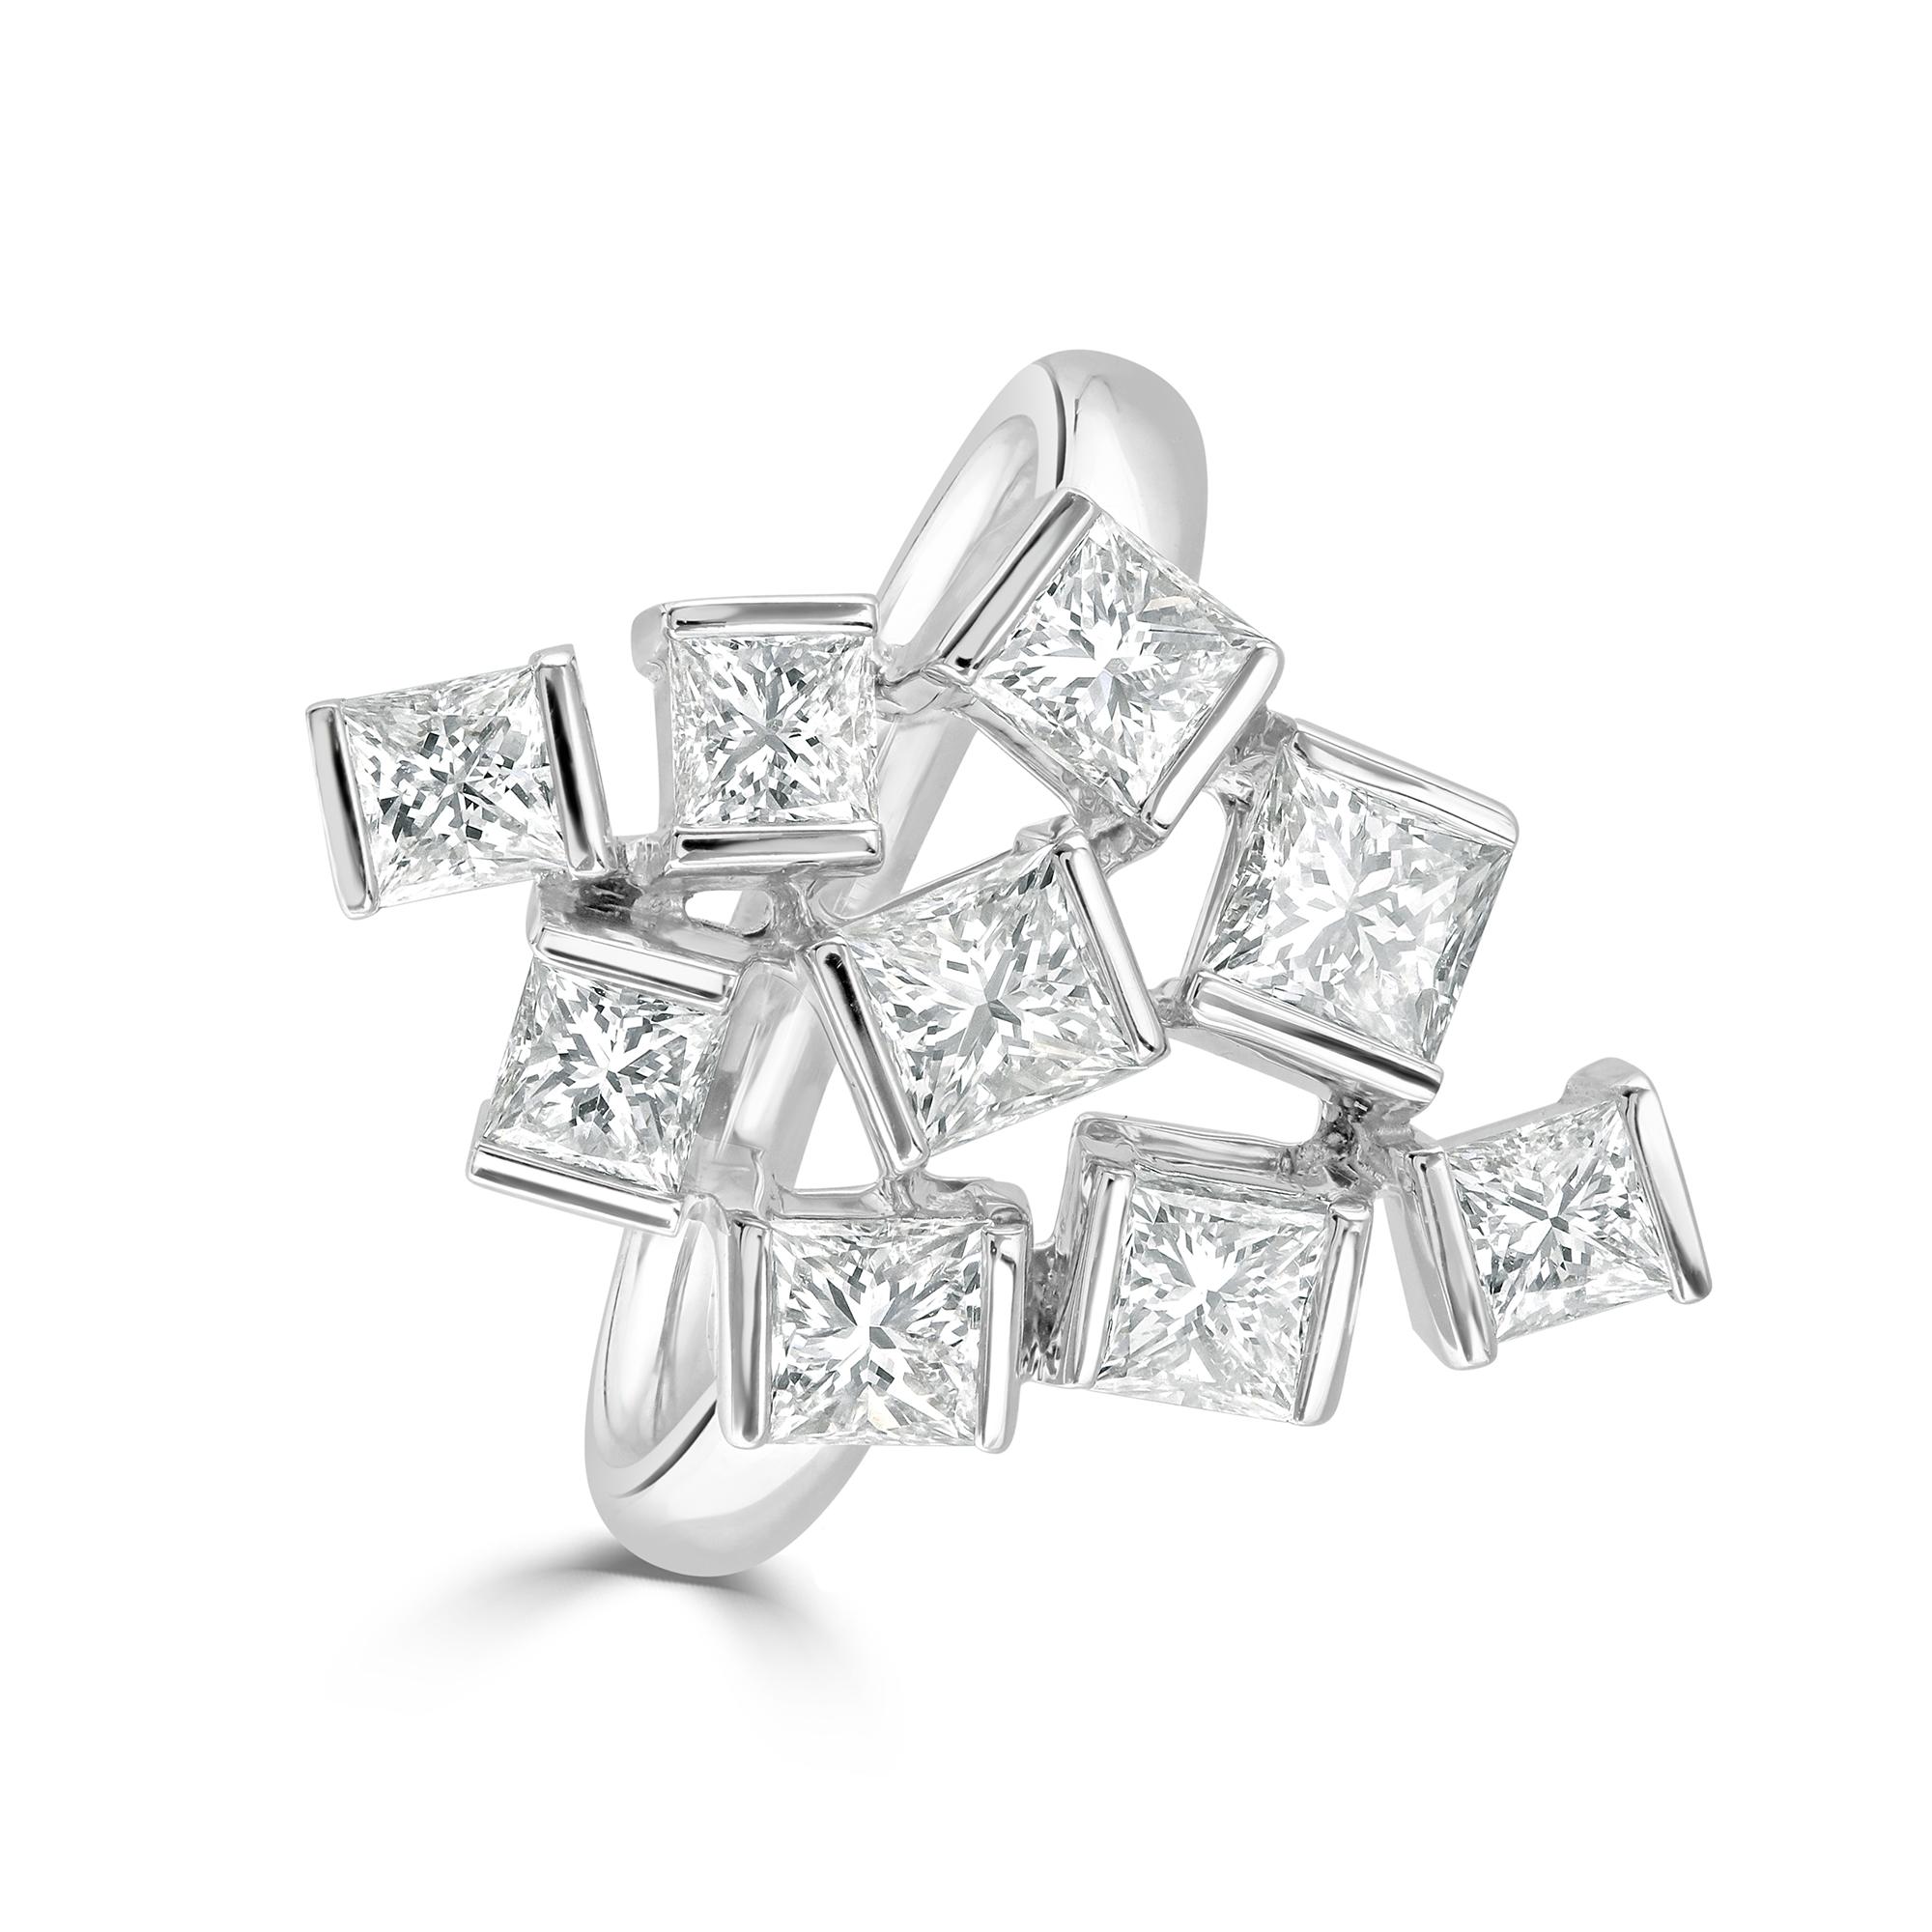 Hopscotch White Gold Diamond Statement Ring